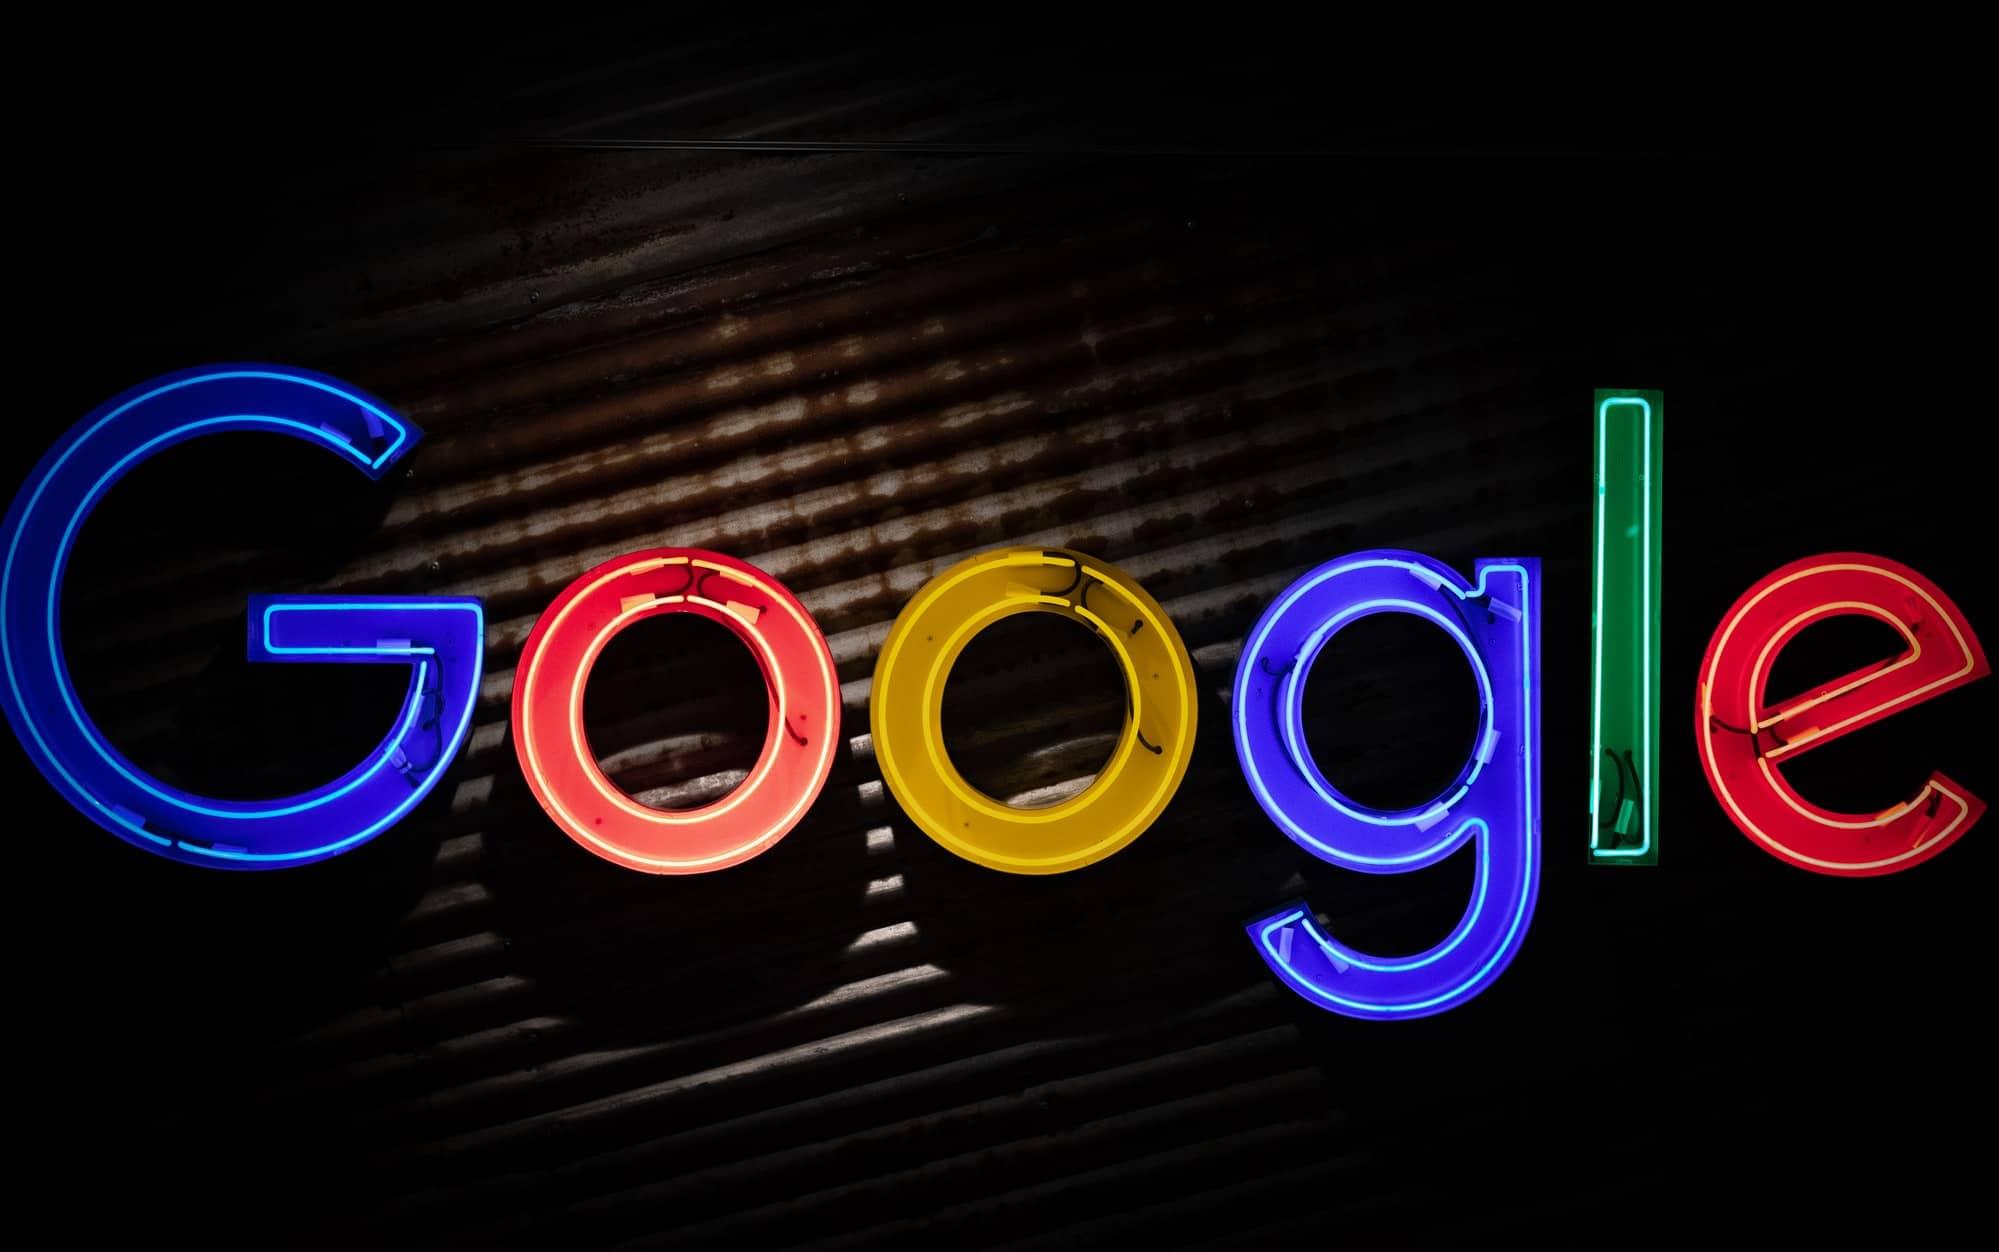 Google letters